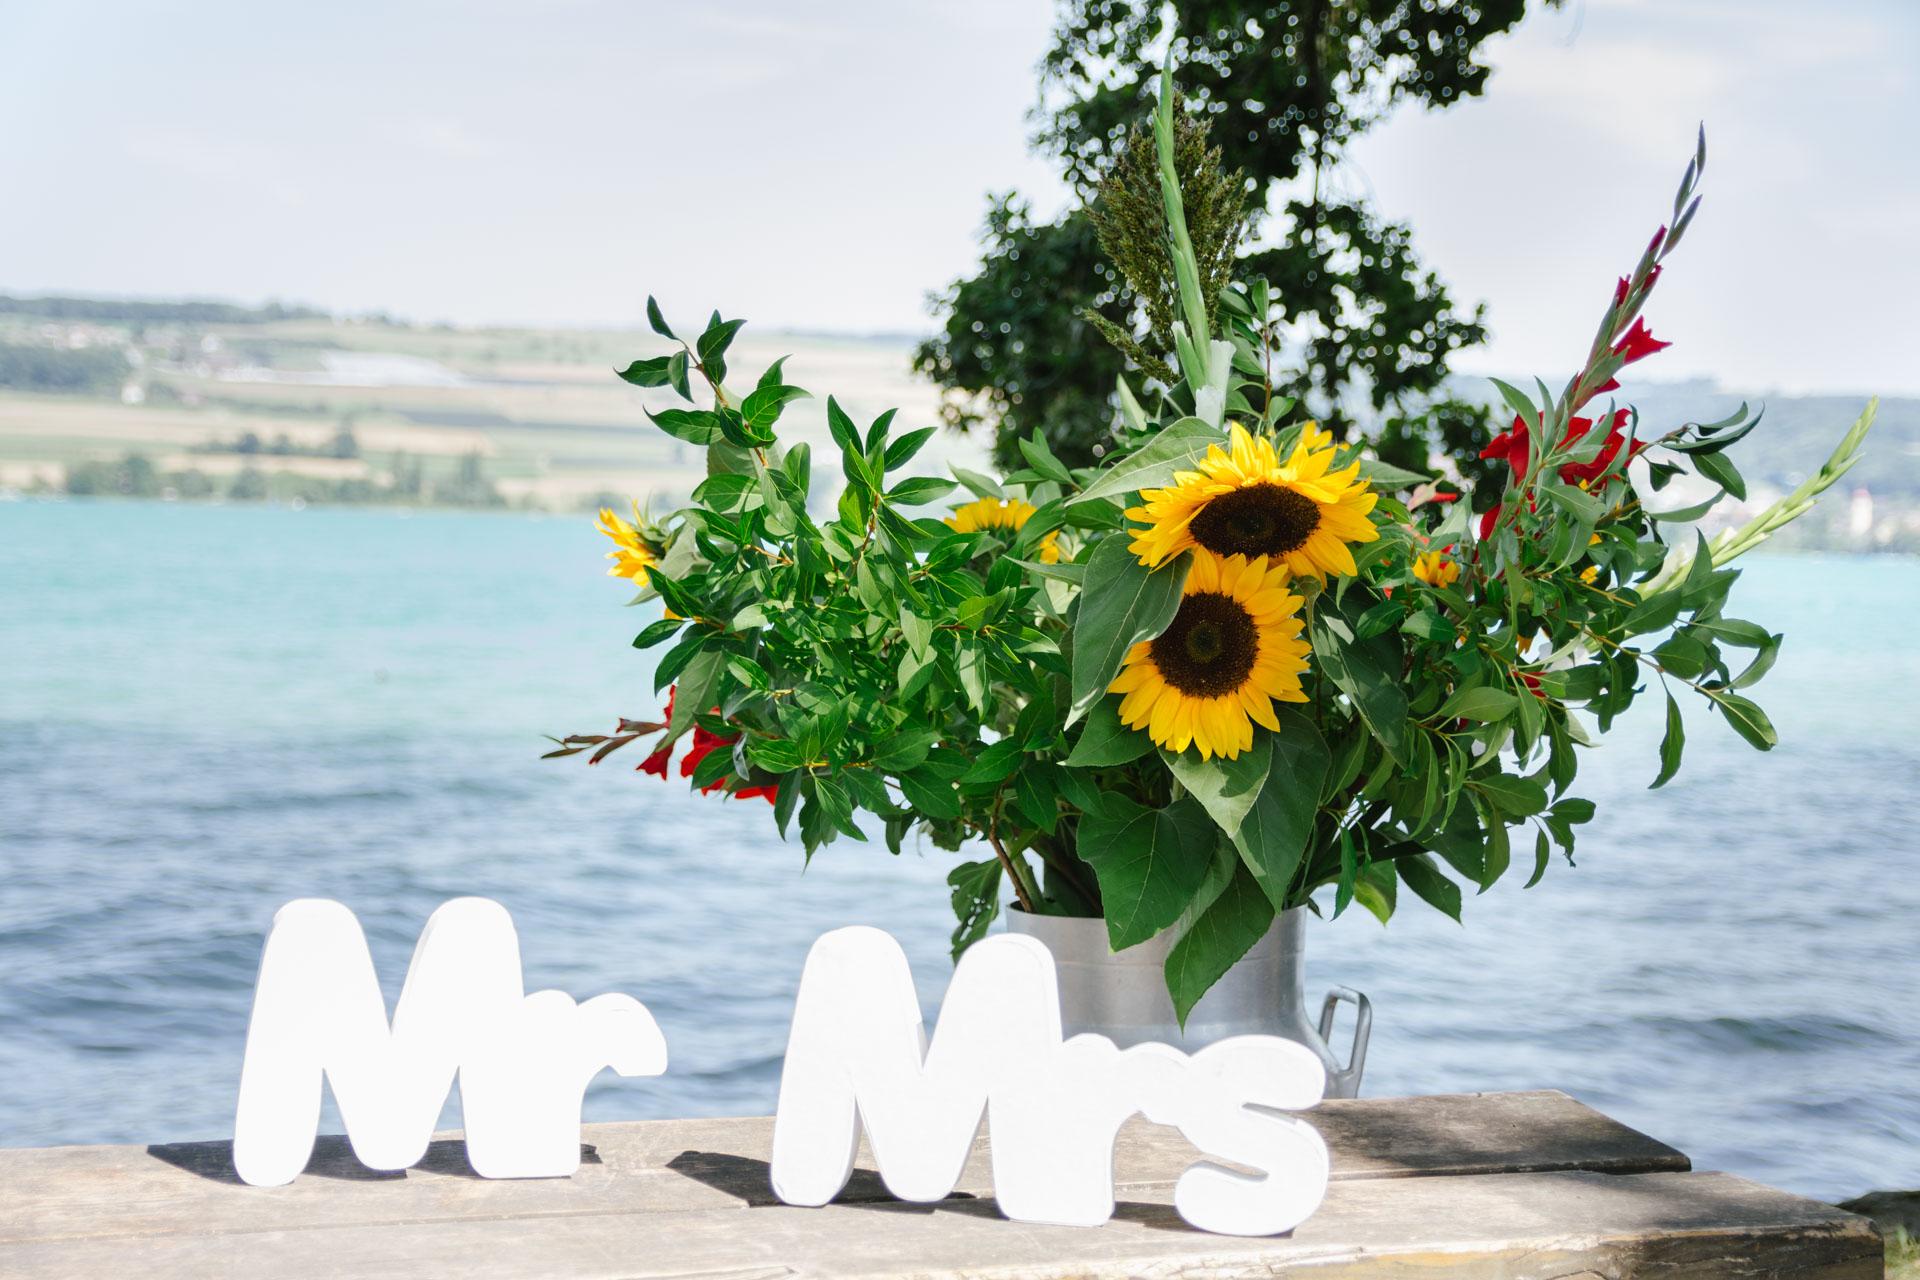 Pixelart_Hochzeitsfotografen_Loerrach_Rheinfelden_Hallwil_Schweiz_Linda-Ramon-1018